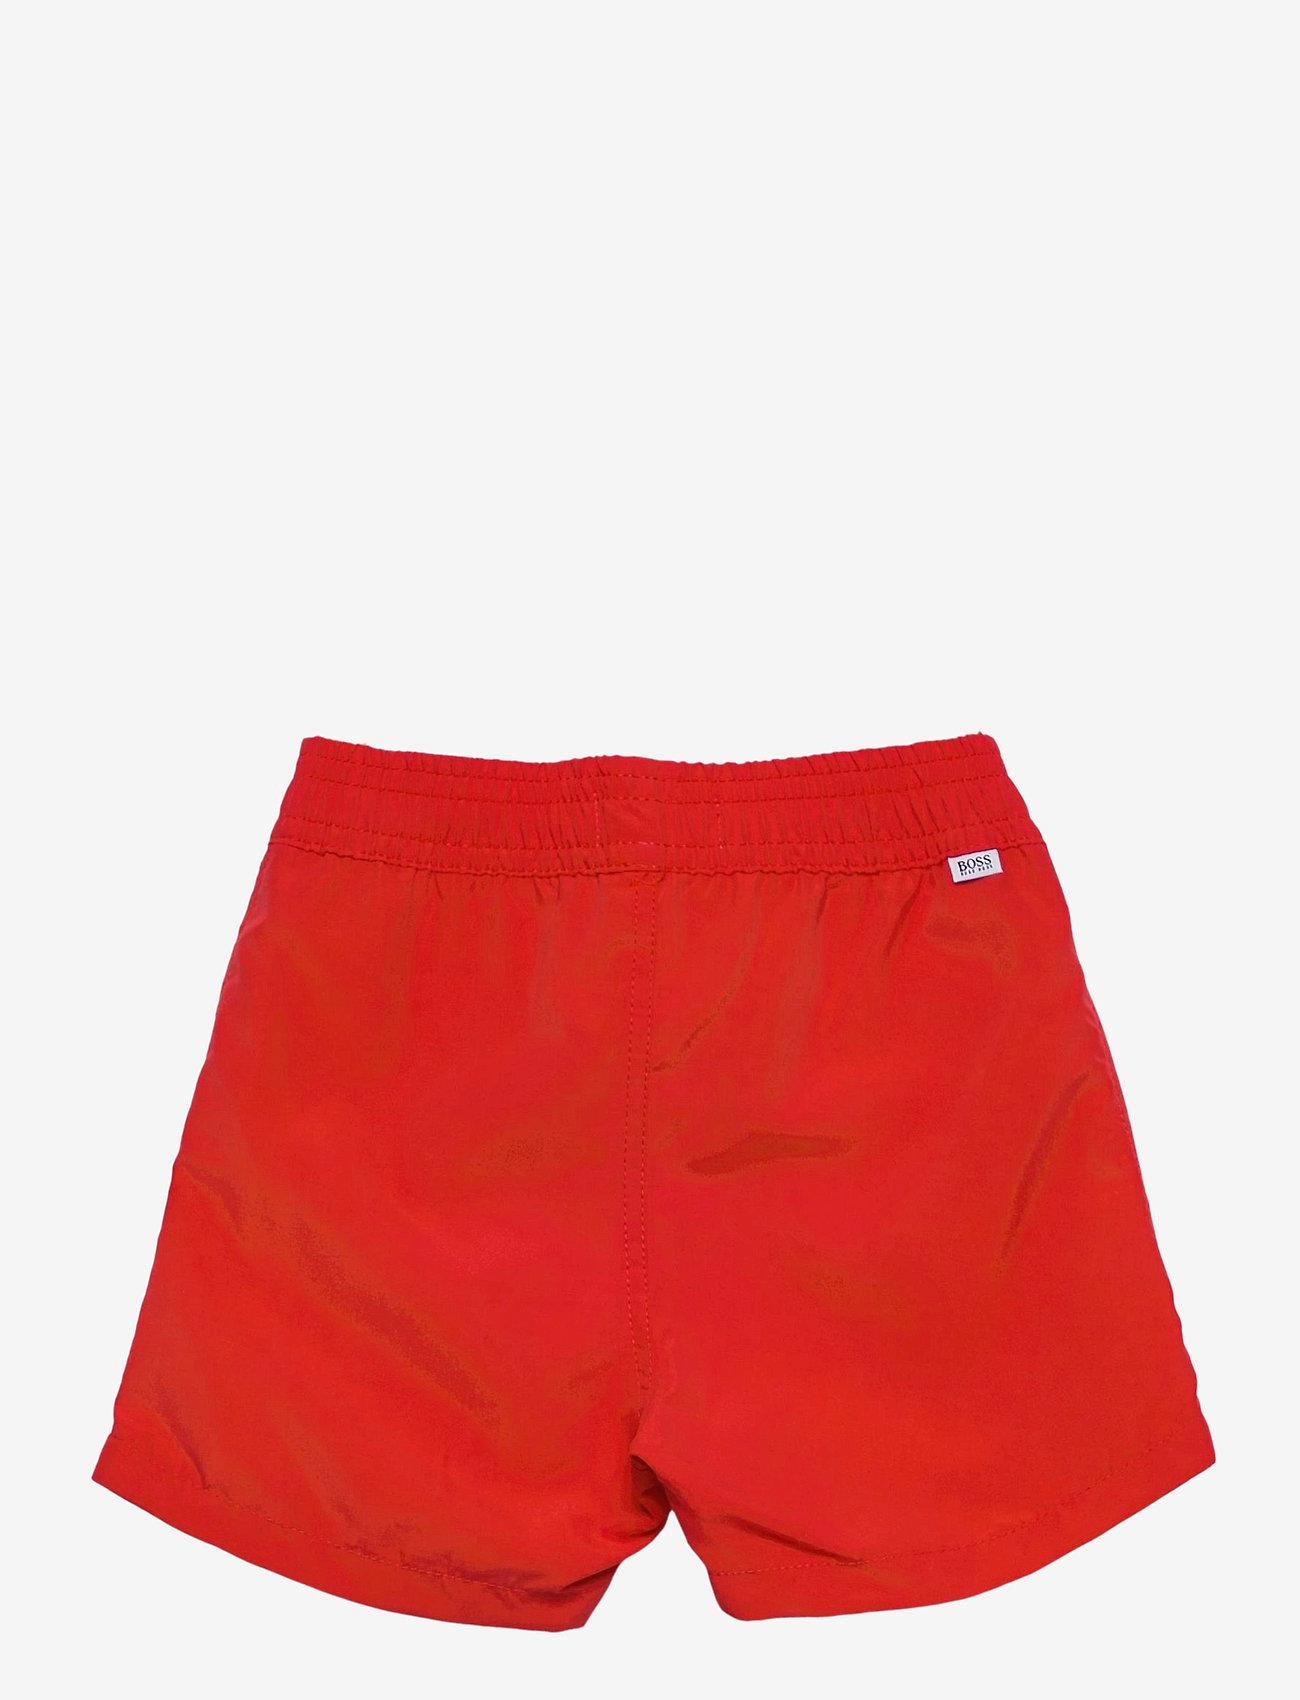 BOSS - SWIM SHORTS - badehosen - bright red - 1